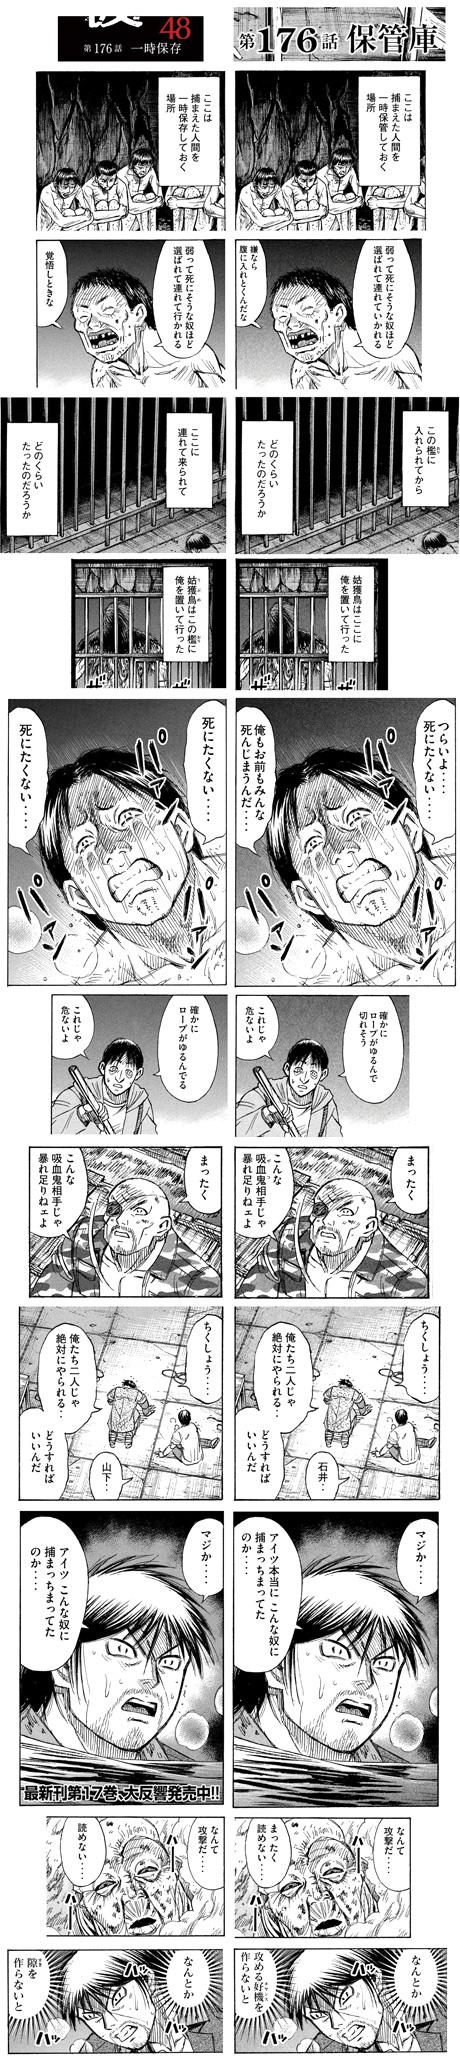 higanjima_48nichigo19-19042002.jpg